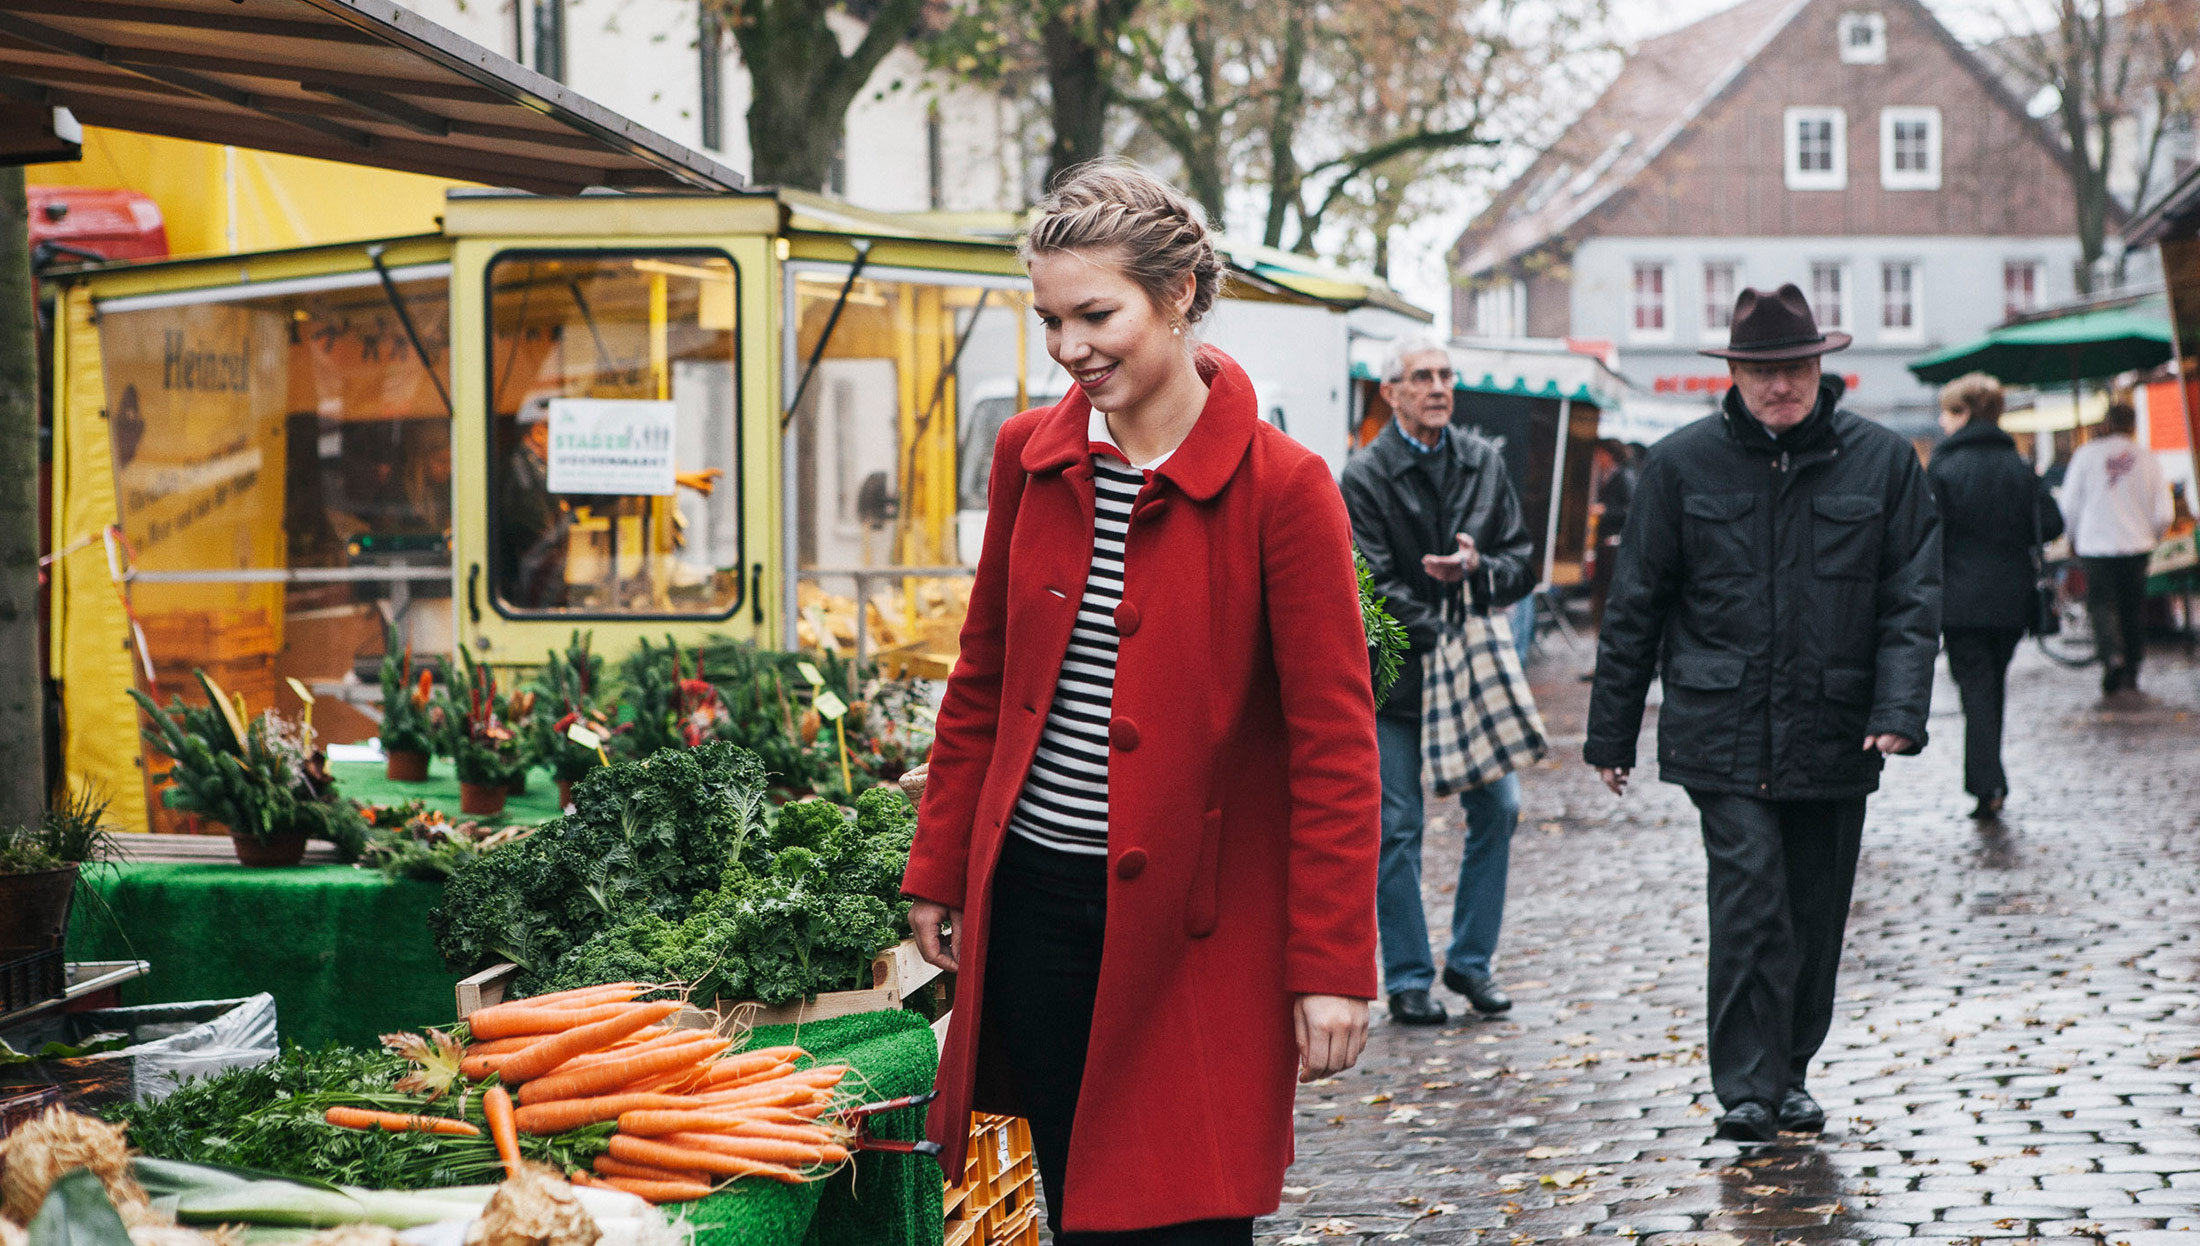 Ndr Theresas Küche | Theresas Kuche Ellijot Corporate Brand Design In Nurnberg